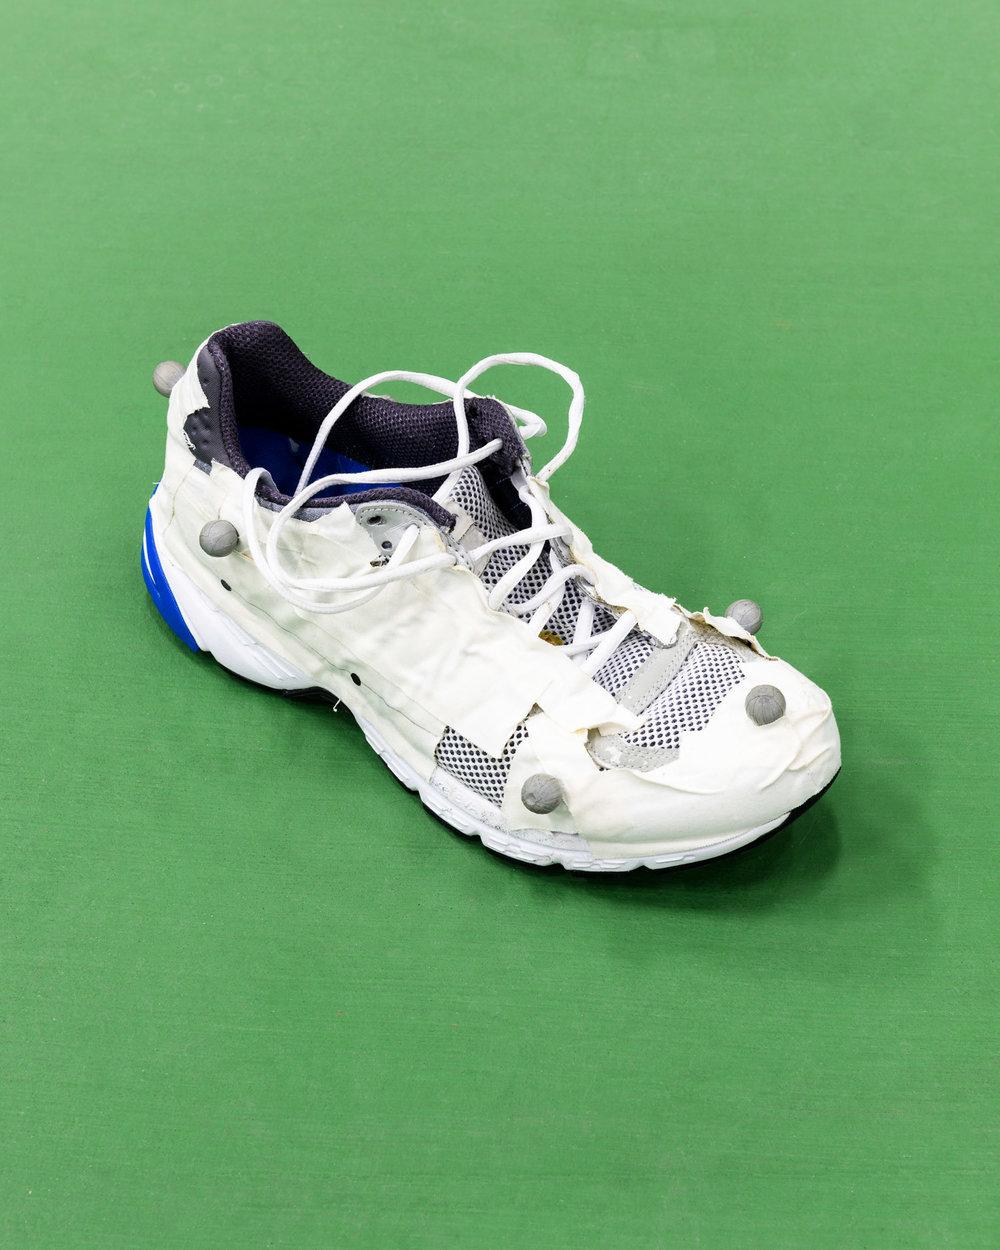 Running shoe prepared for motion analysis test